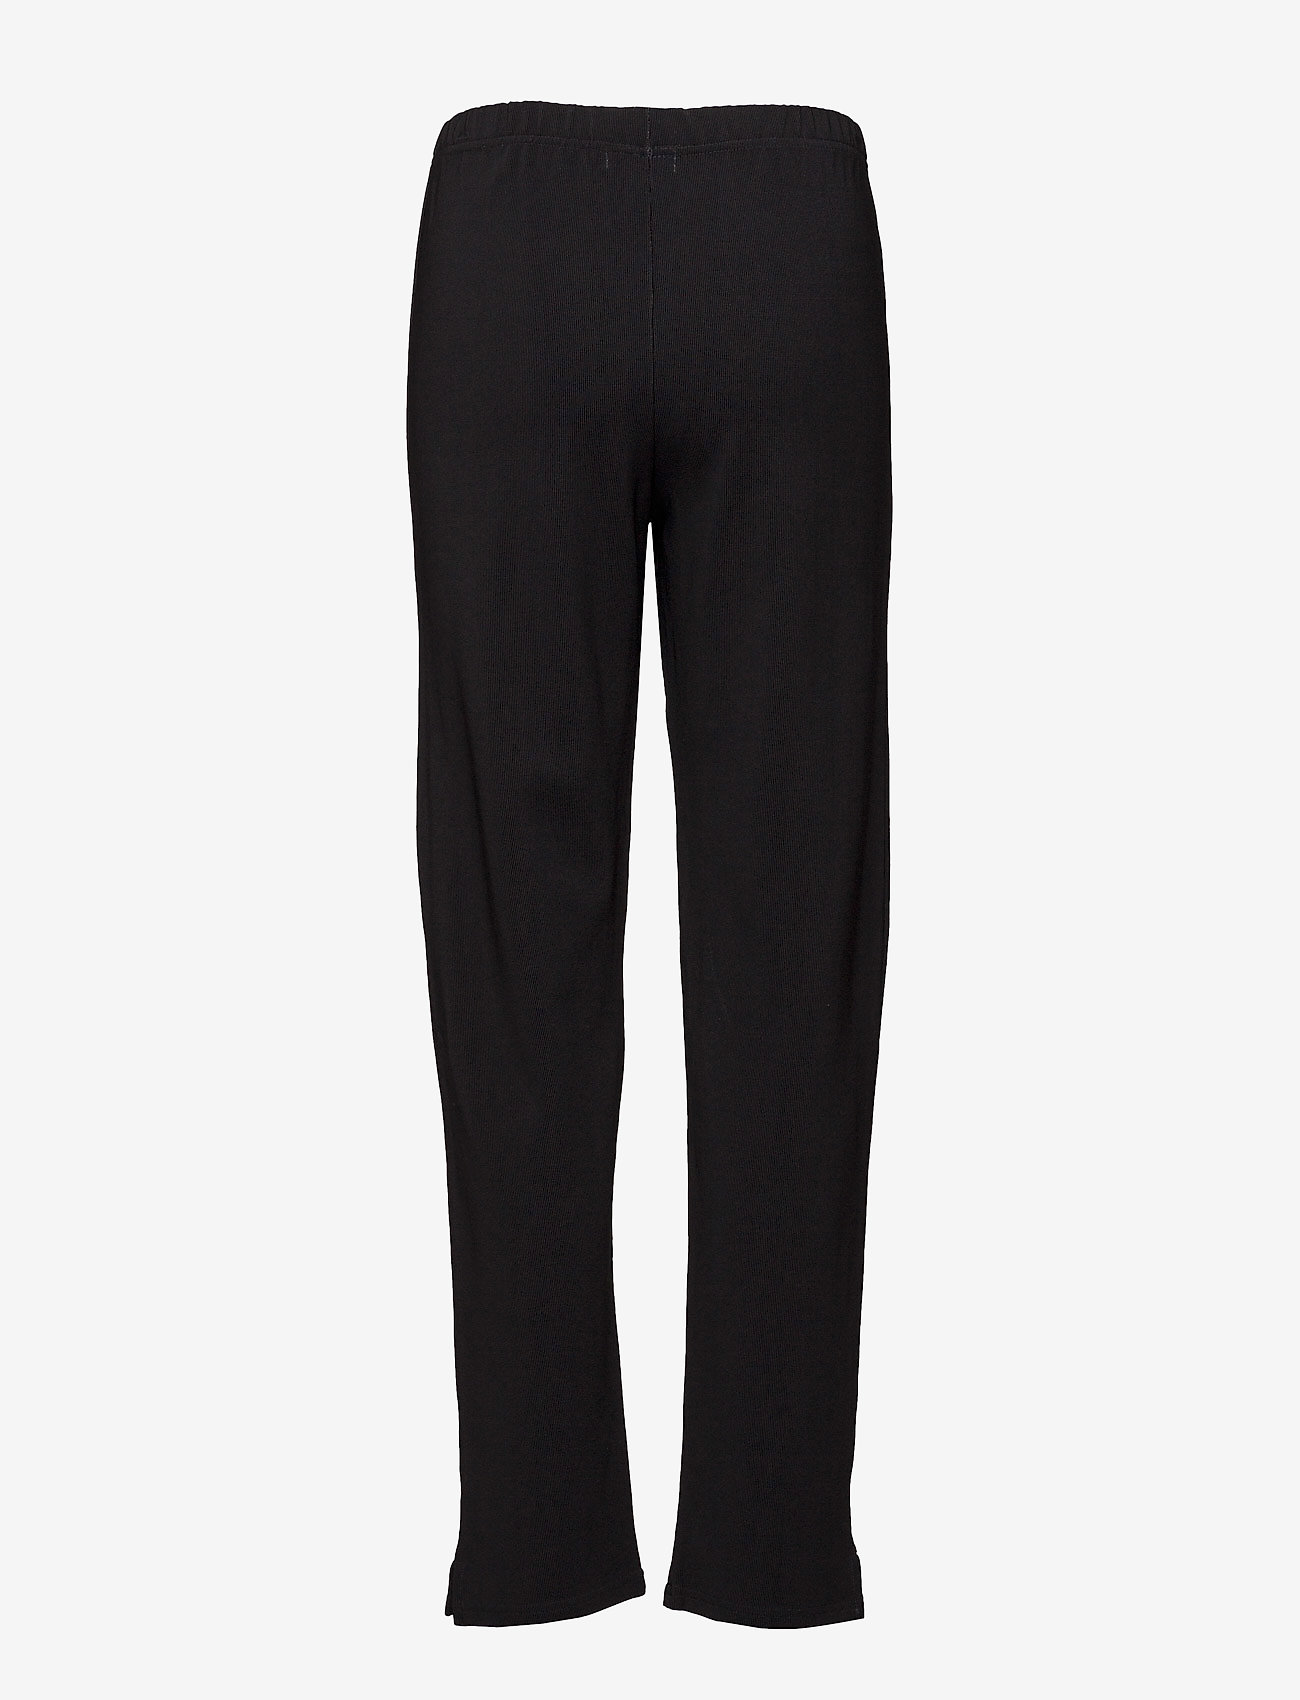 Masai - Priam - spodnie szerokie - black - 1